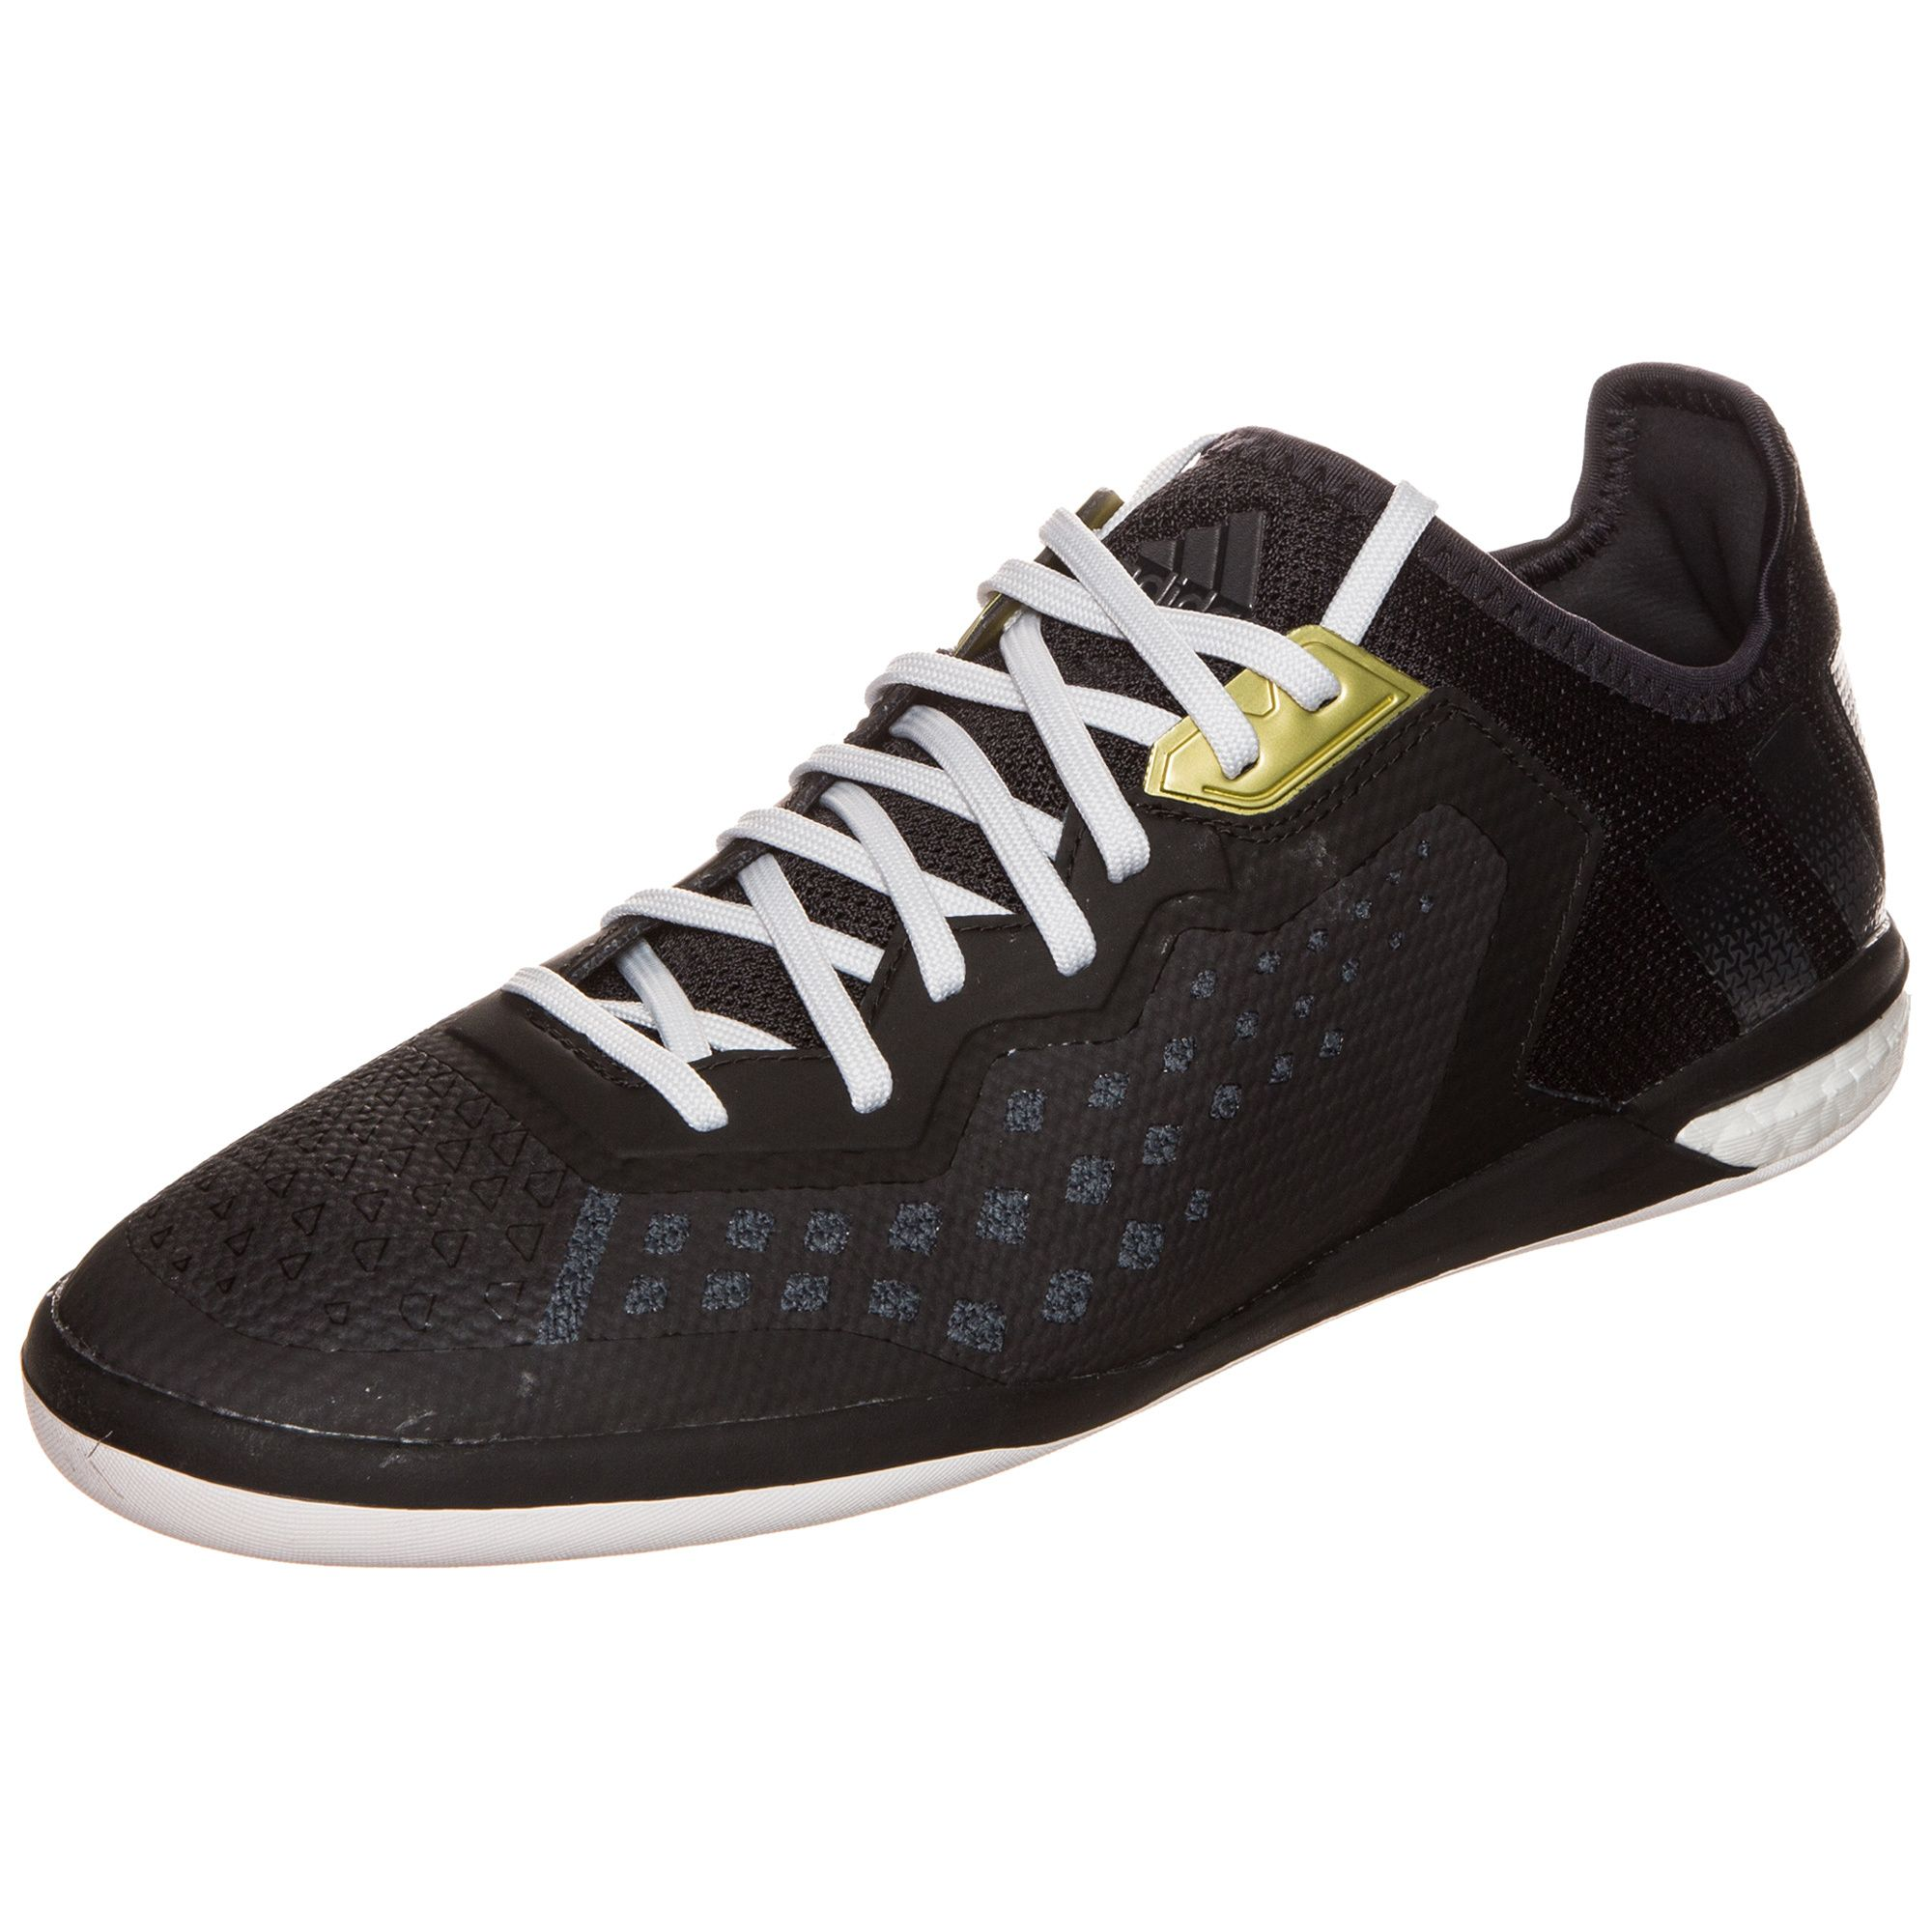 ADIDAS PERFORMANCE adidas Performance ACE 16.1 Court Indoor Fußballschuh Herren